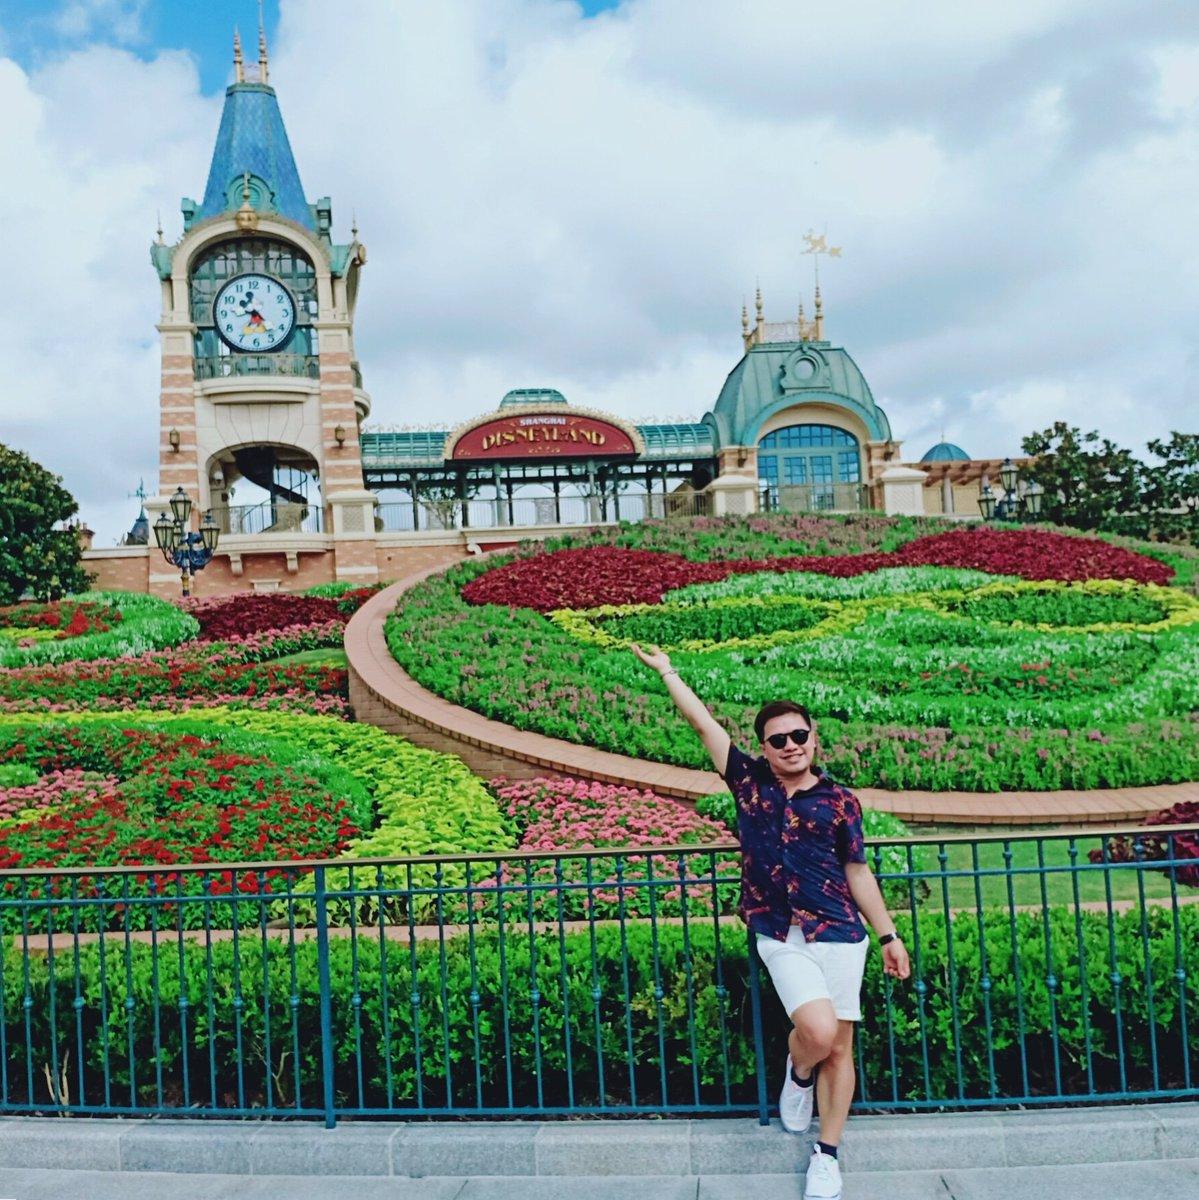 At the happiest place on Earth! #ShanghaiDisneyland #ChikkanessTravels #TravelBlogger #TravelDiaries